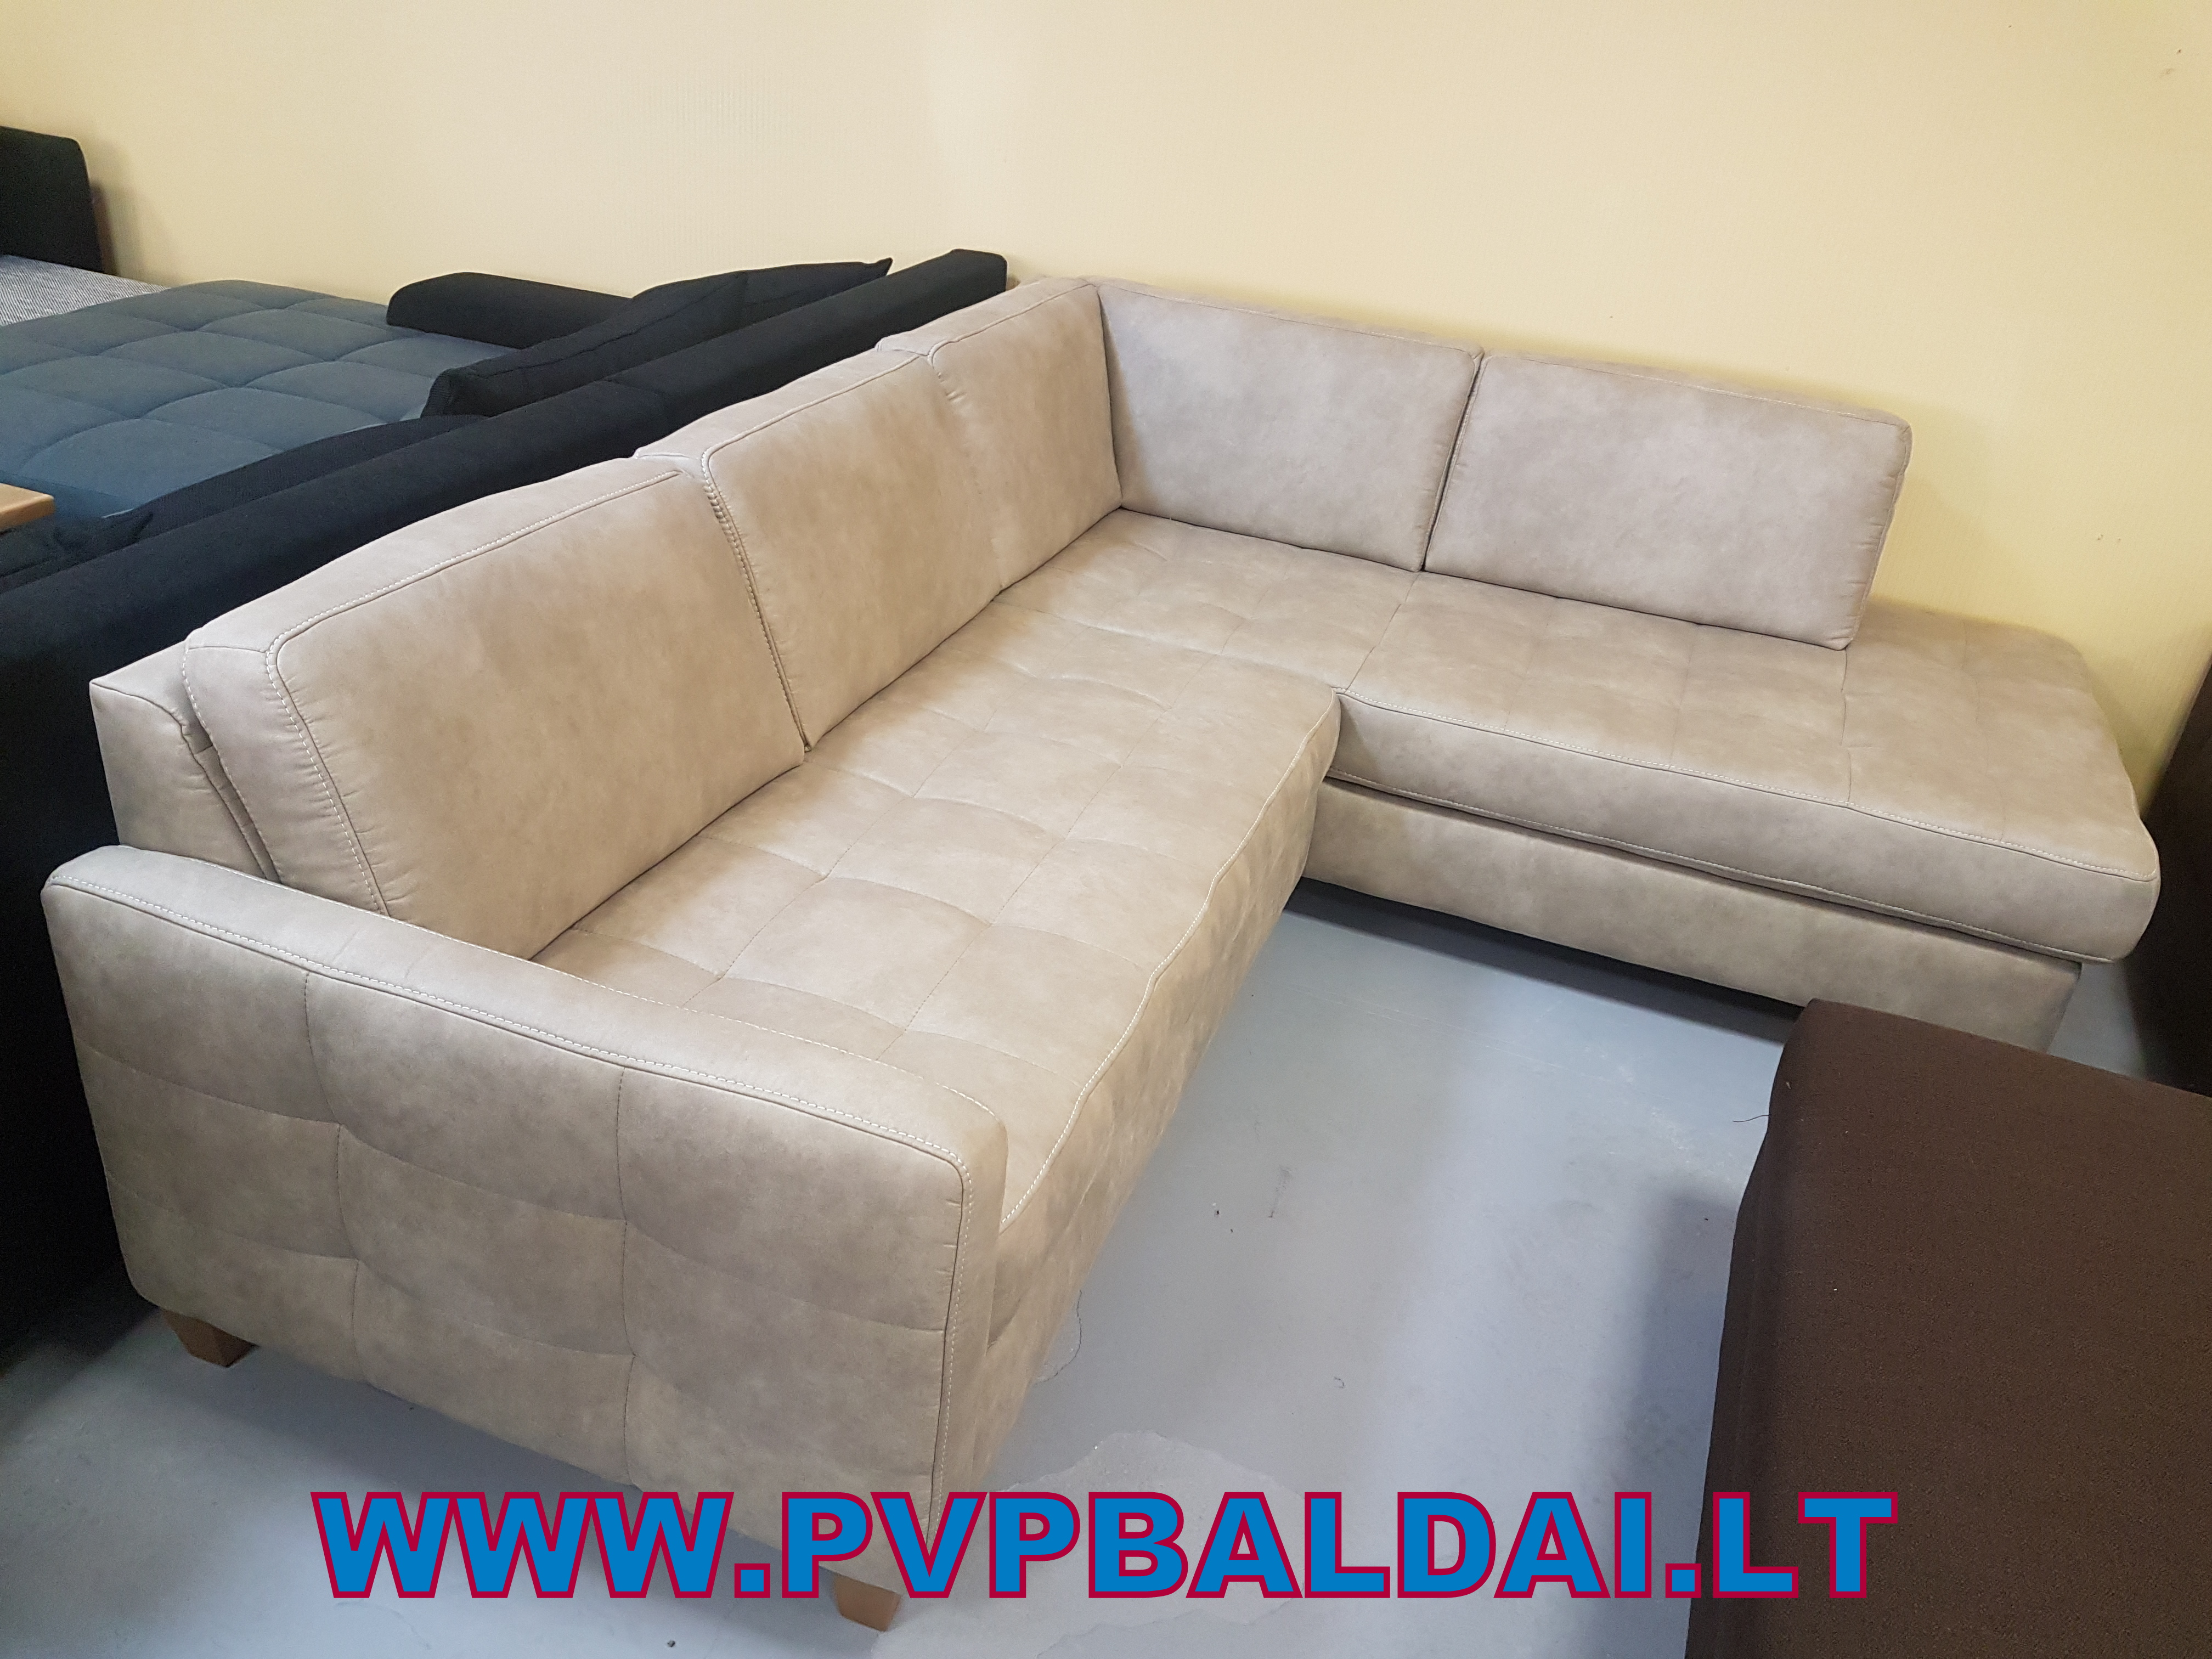 pvp baldai3